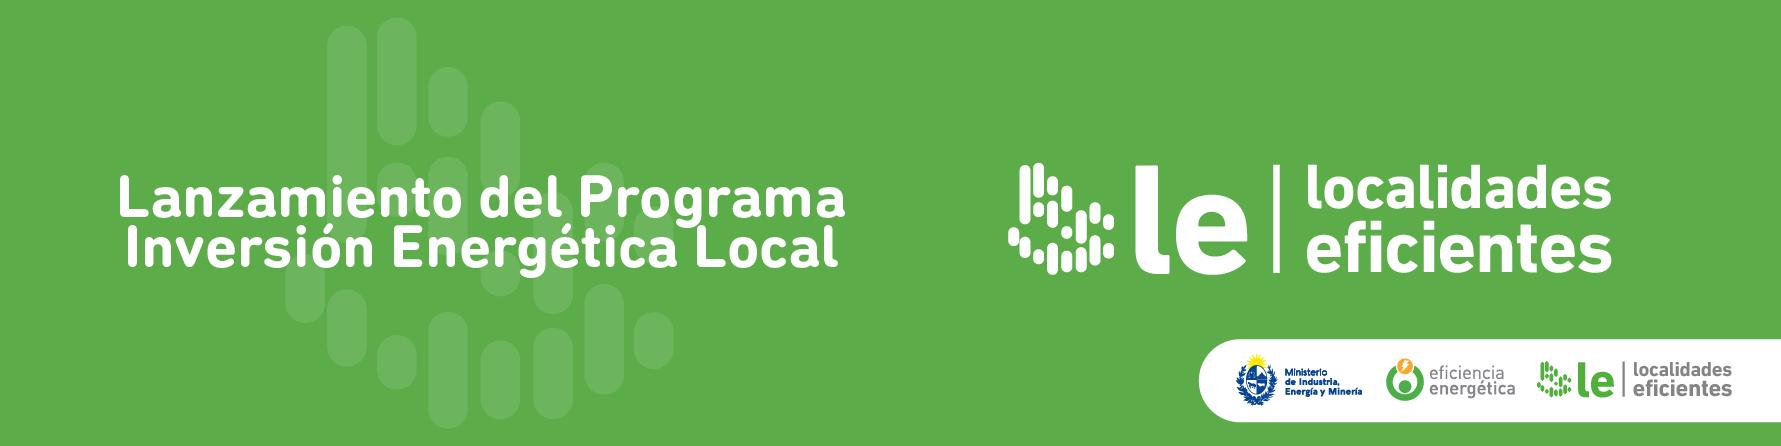 Programa Localidades Eficientes